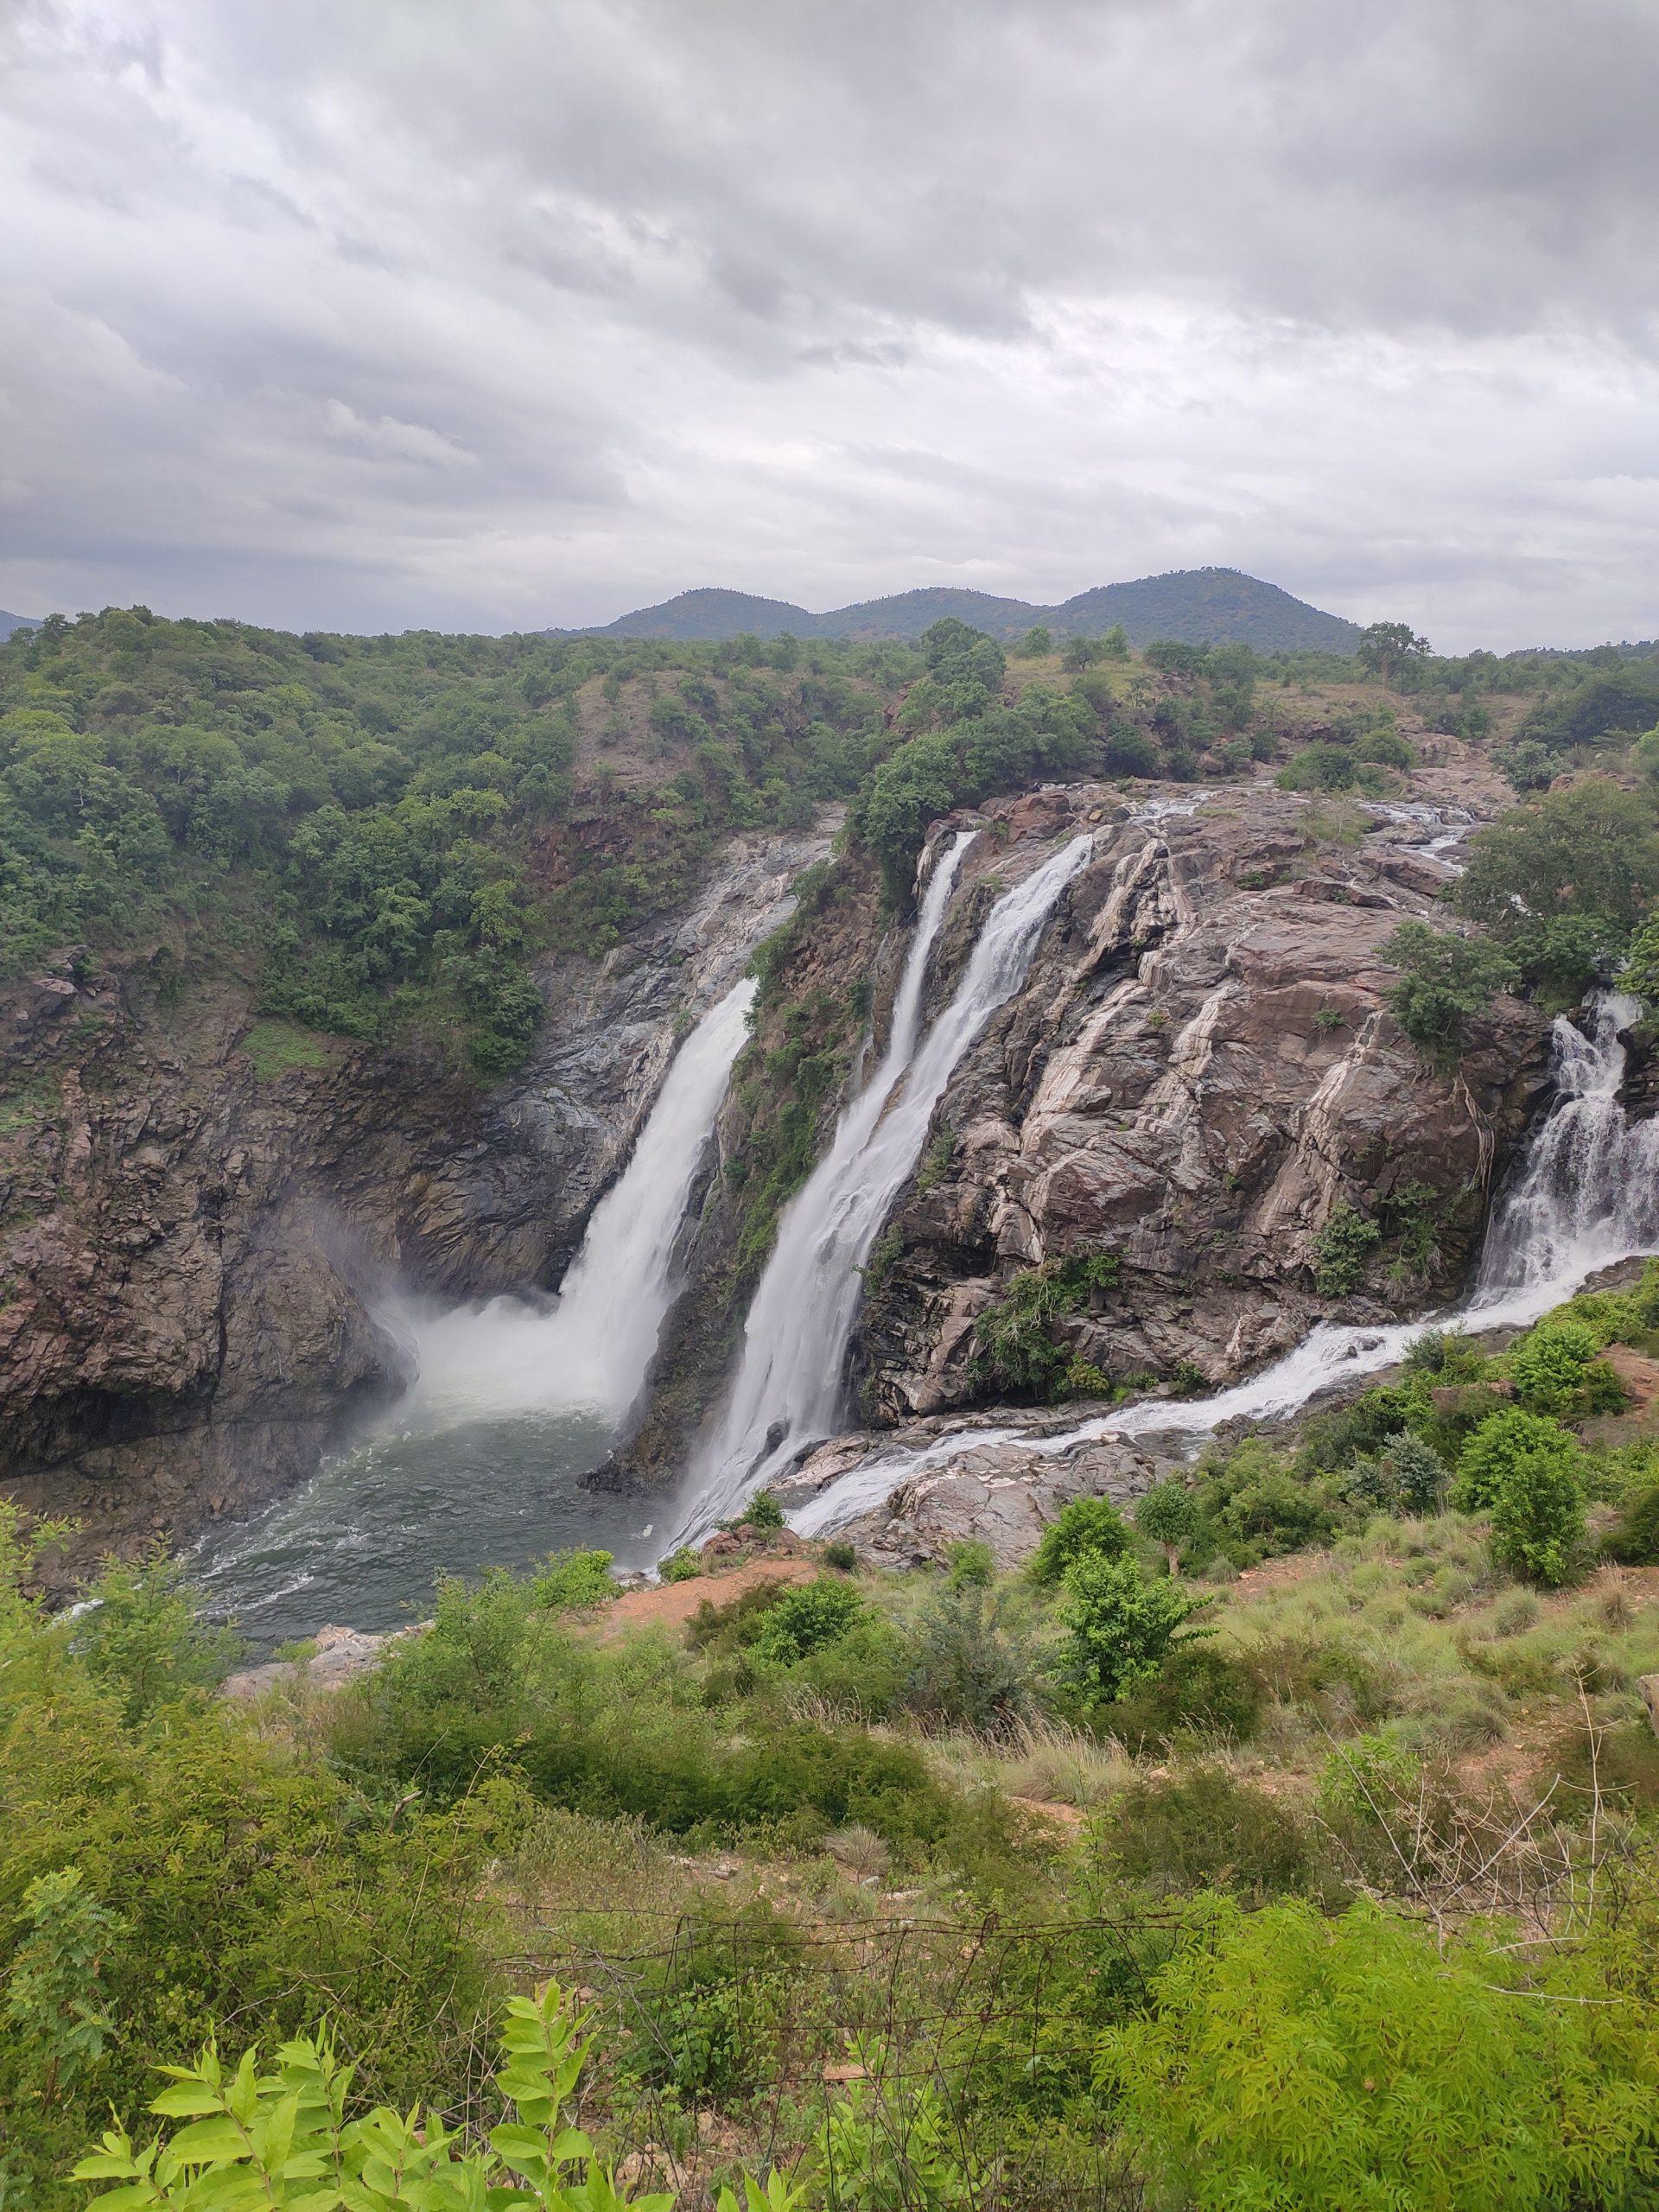 Water Falls among Hills